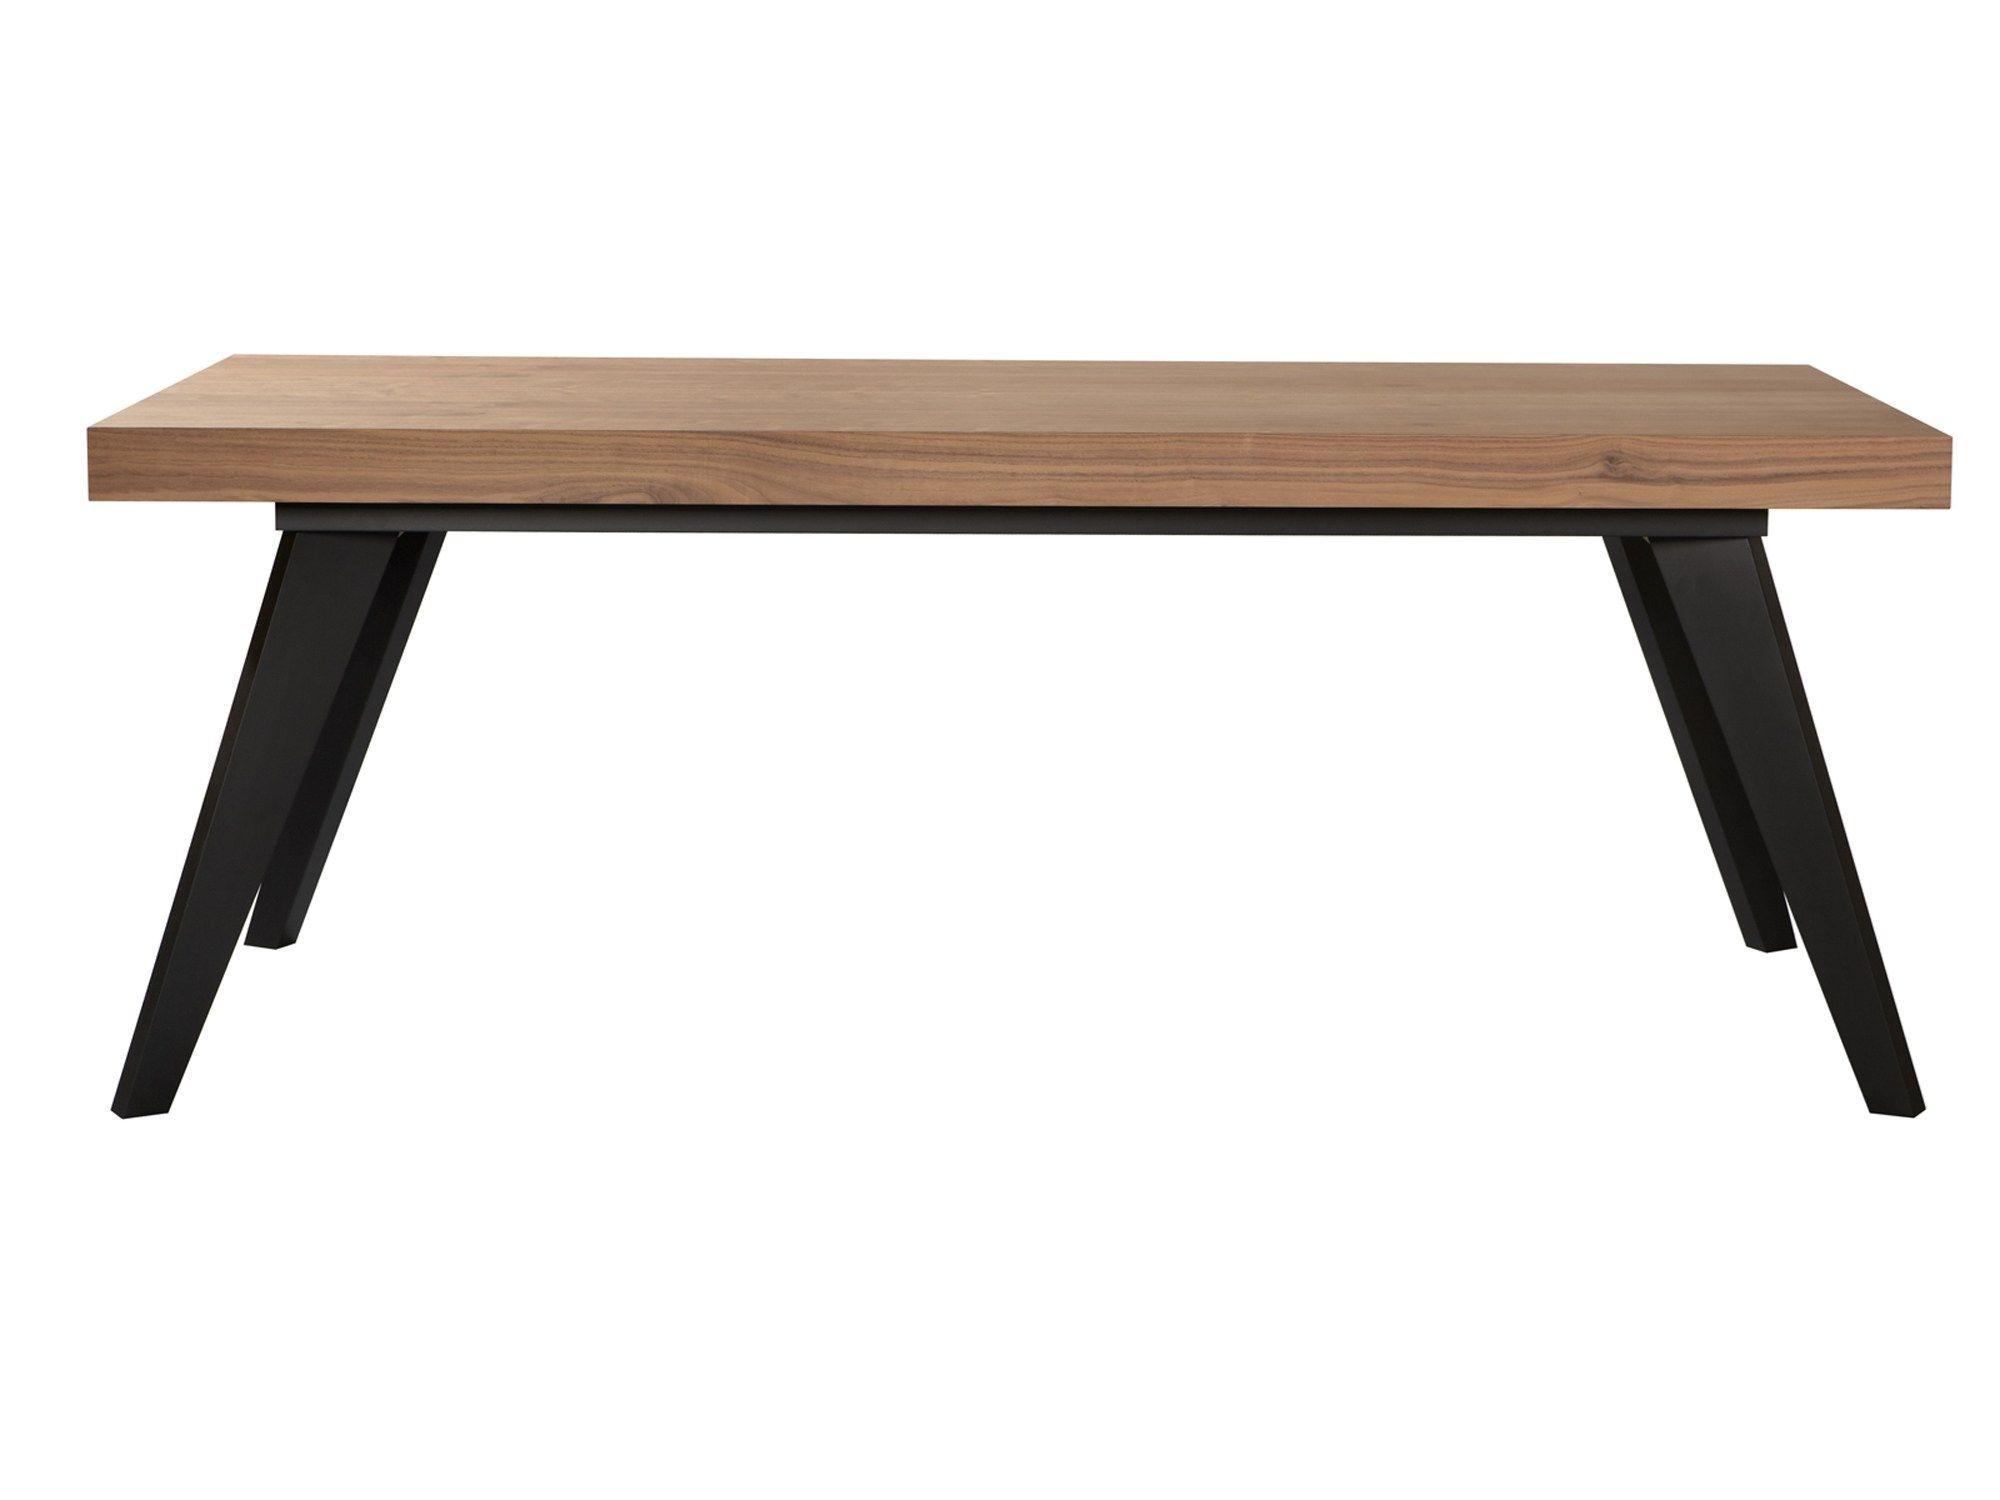 WOOD VENEER DINING TABLE KYLL BY AZEA DESIGN VICTOR CAETANO : prodotti 127432 relf0cffedd2f3c4e3cb7caf95f0efbb01e from www.archiproducts.com size 2000 x 1500 jpeg 108kB